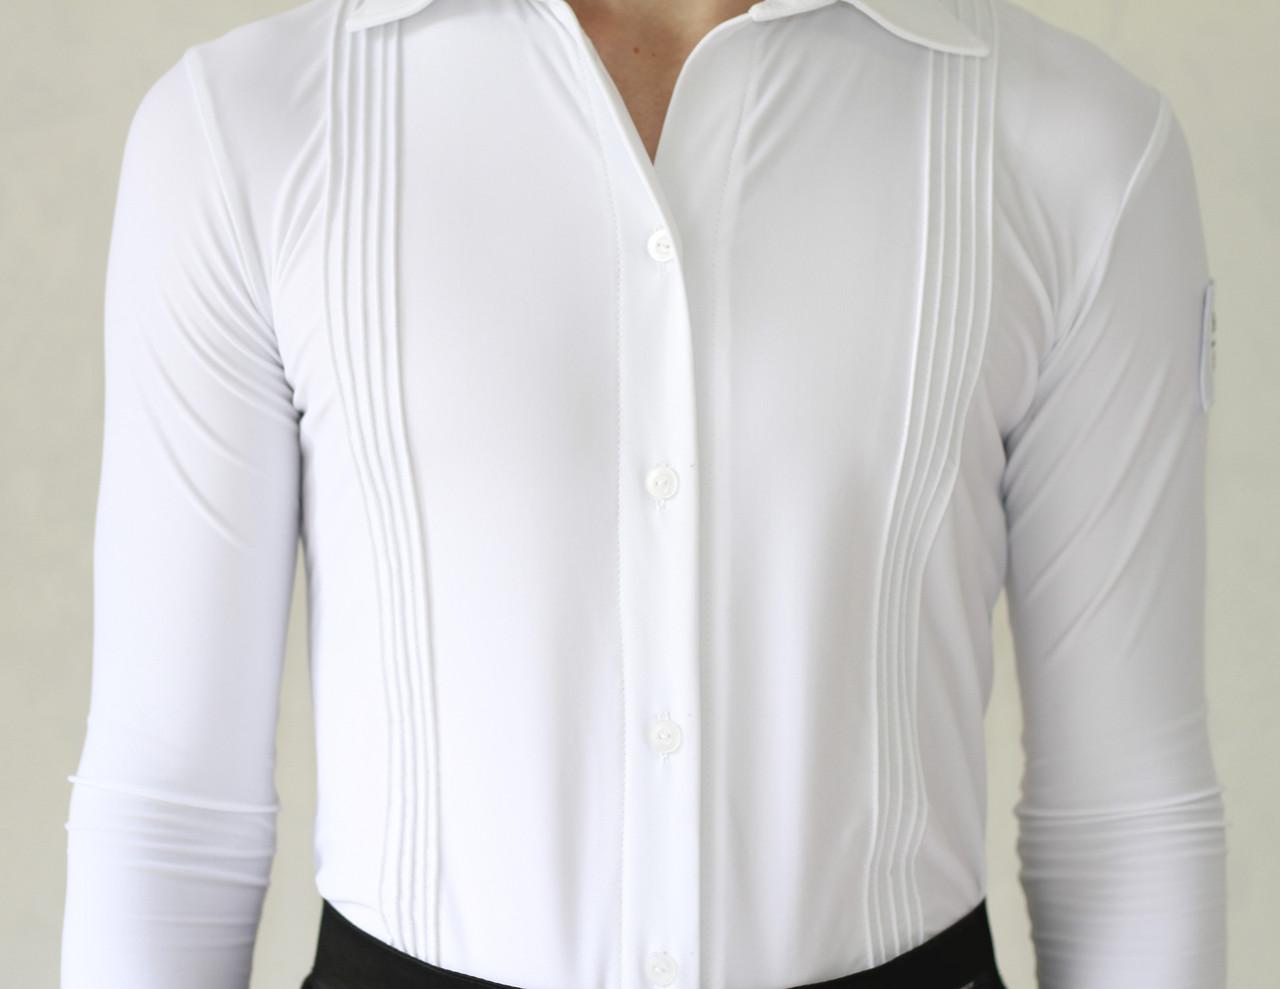 Рубашка для бальных танцев матовая SevenStore белая с защипами